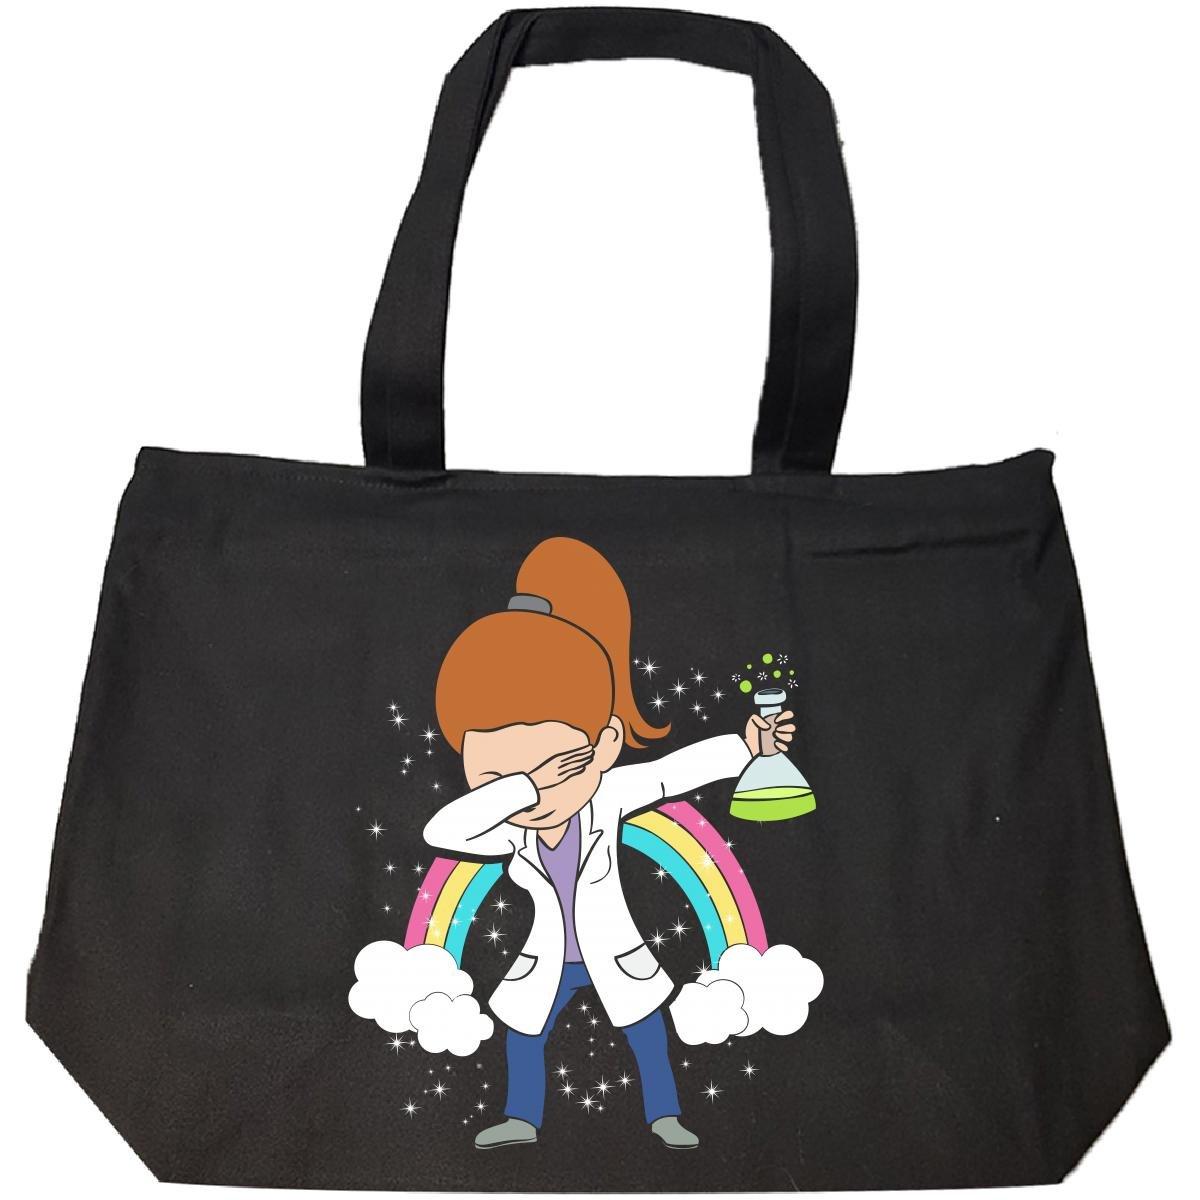 Dabbing Mom Wearing Labcoat Scientist Brunette Hair Gift - Tote Bag With Zip